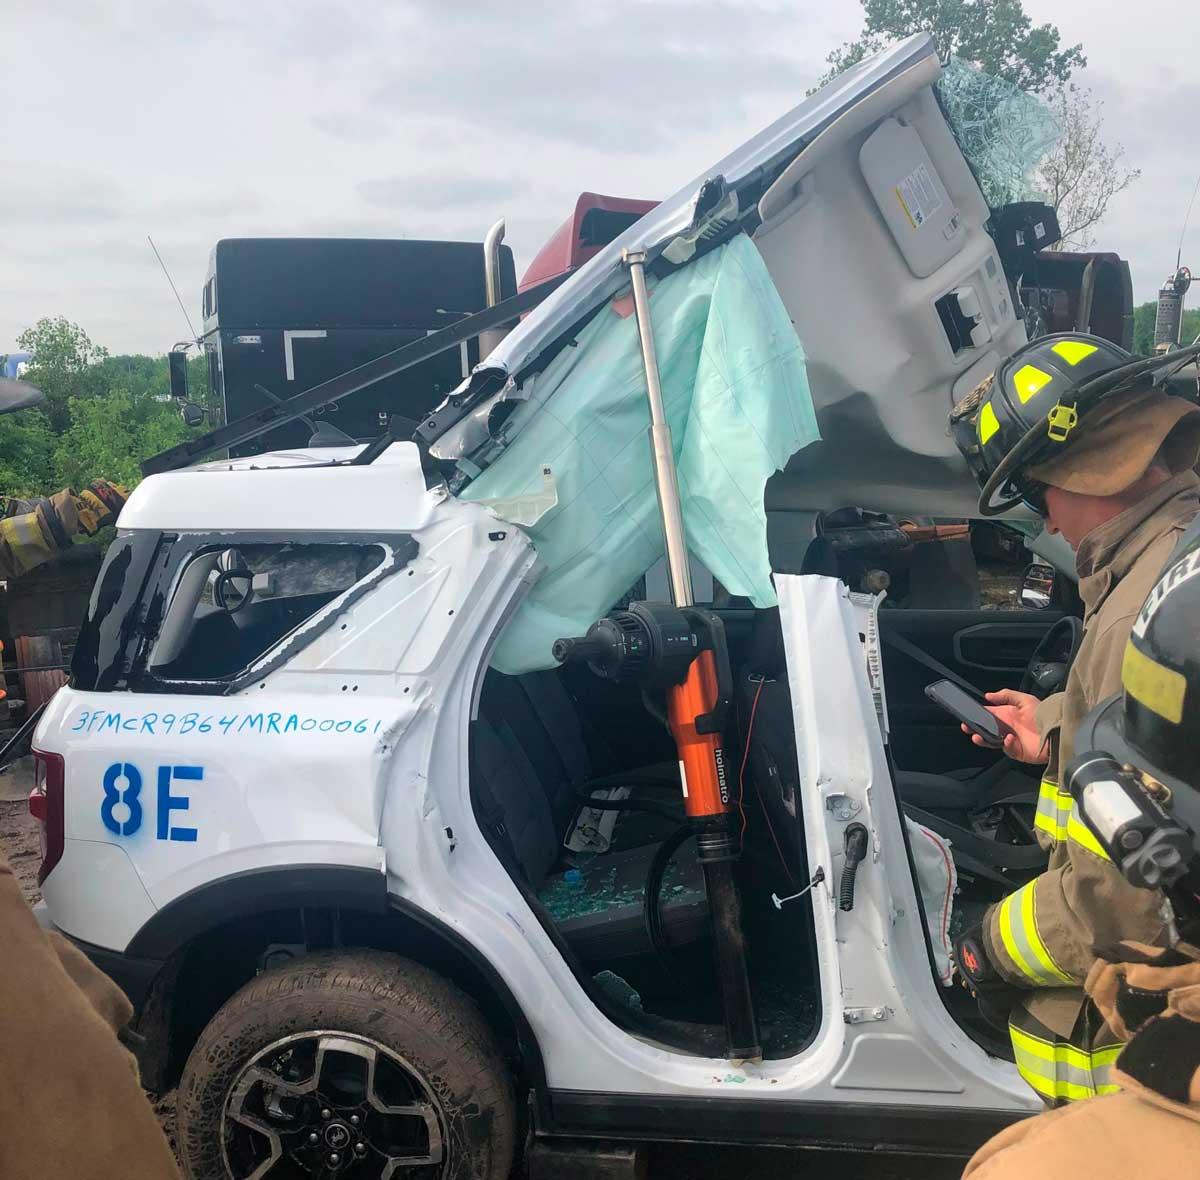 ford bronco sport treinamento resgate bombeiros